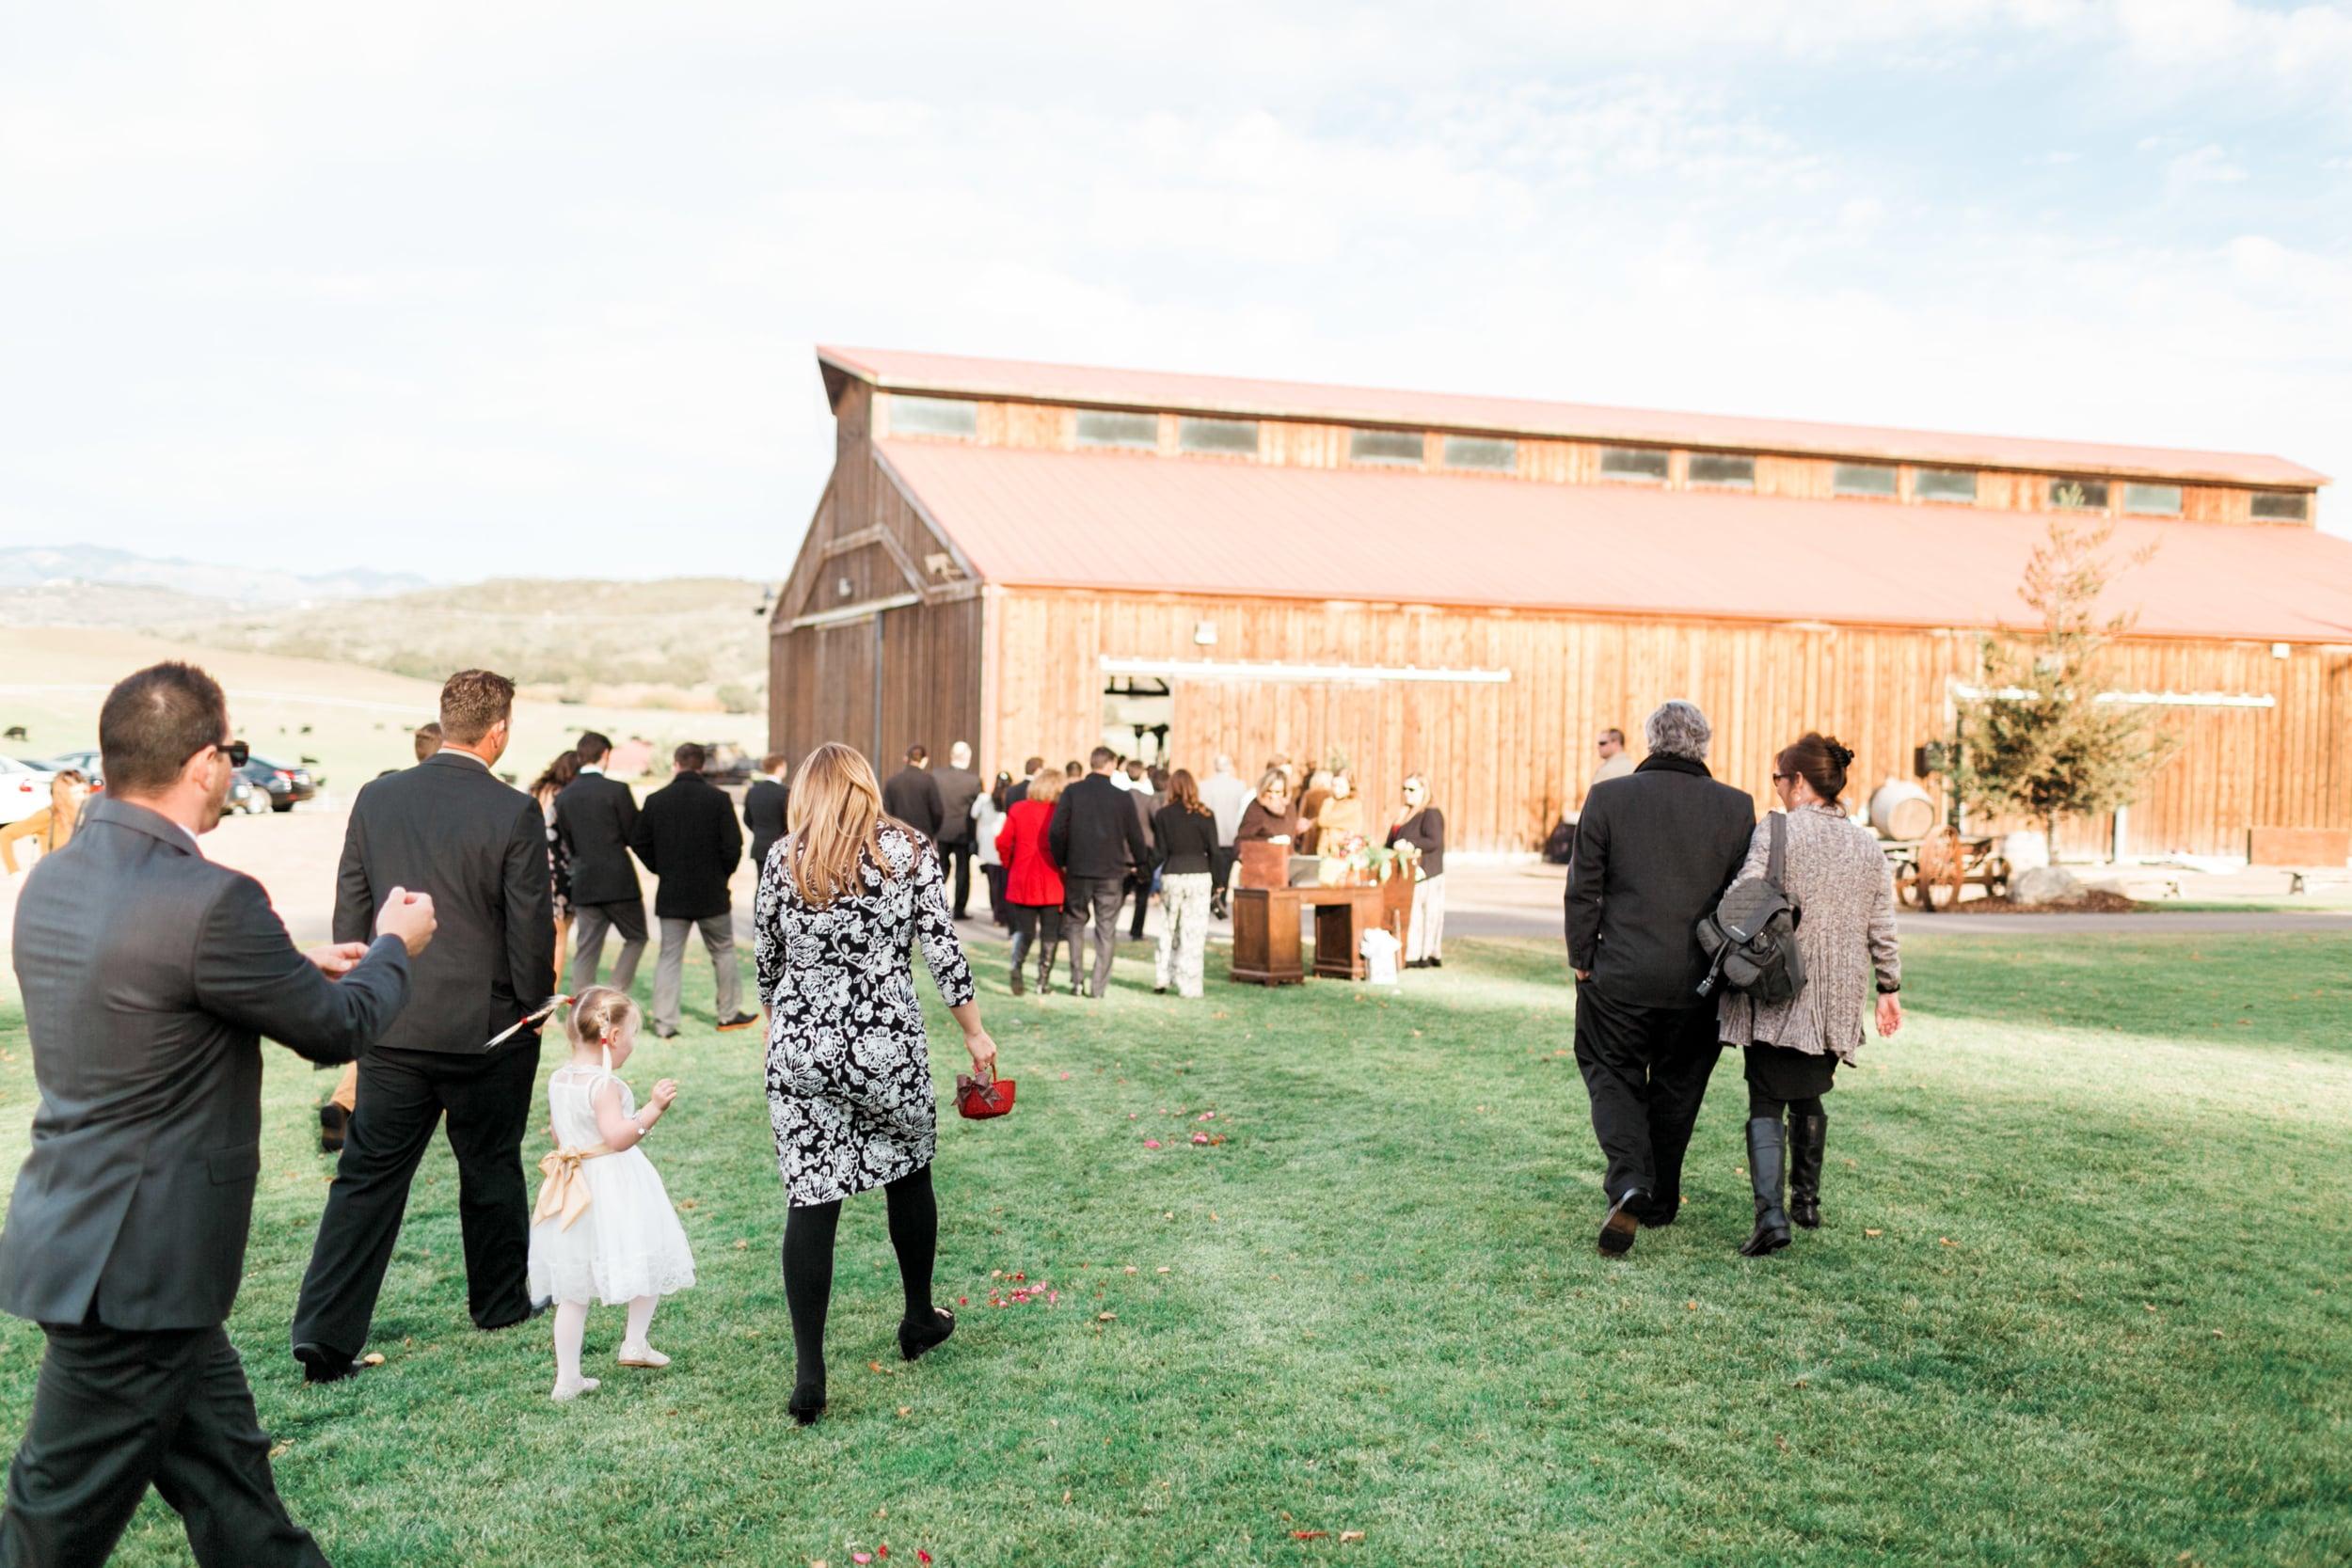 Natalie_Schutt_Photography_Winter_Wedding_San_Luis_Obispo-151.jpg